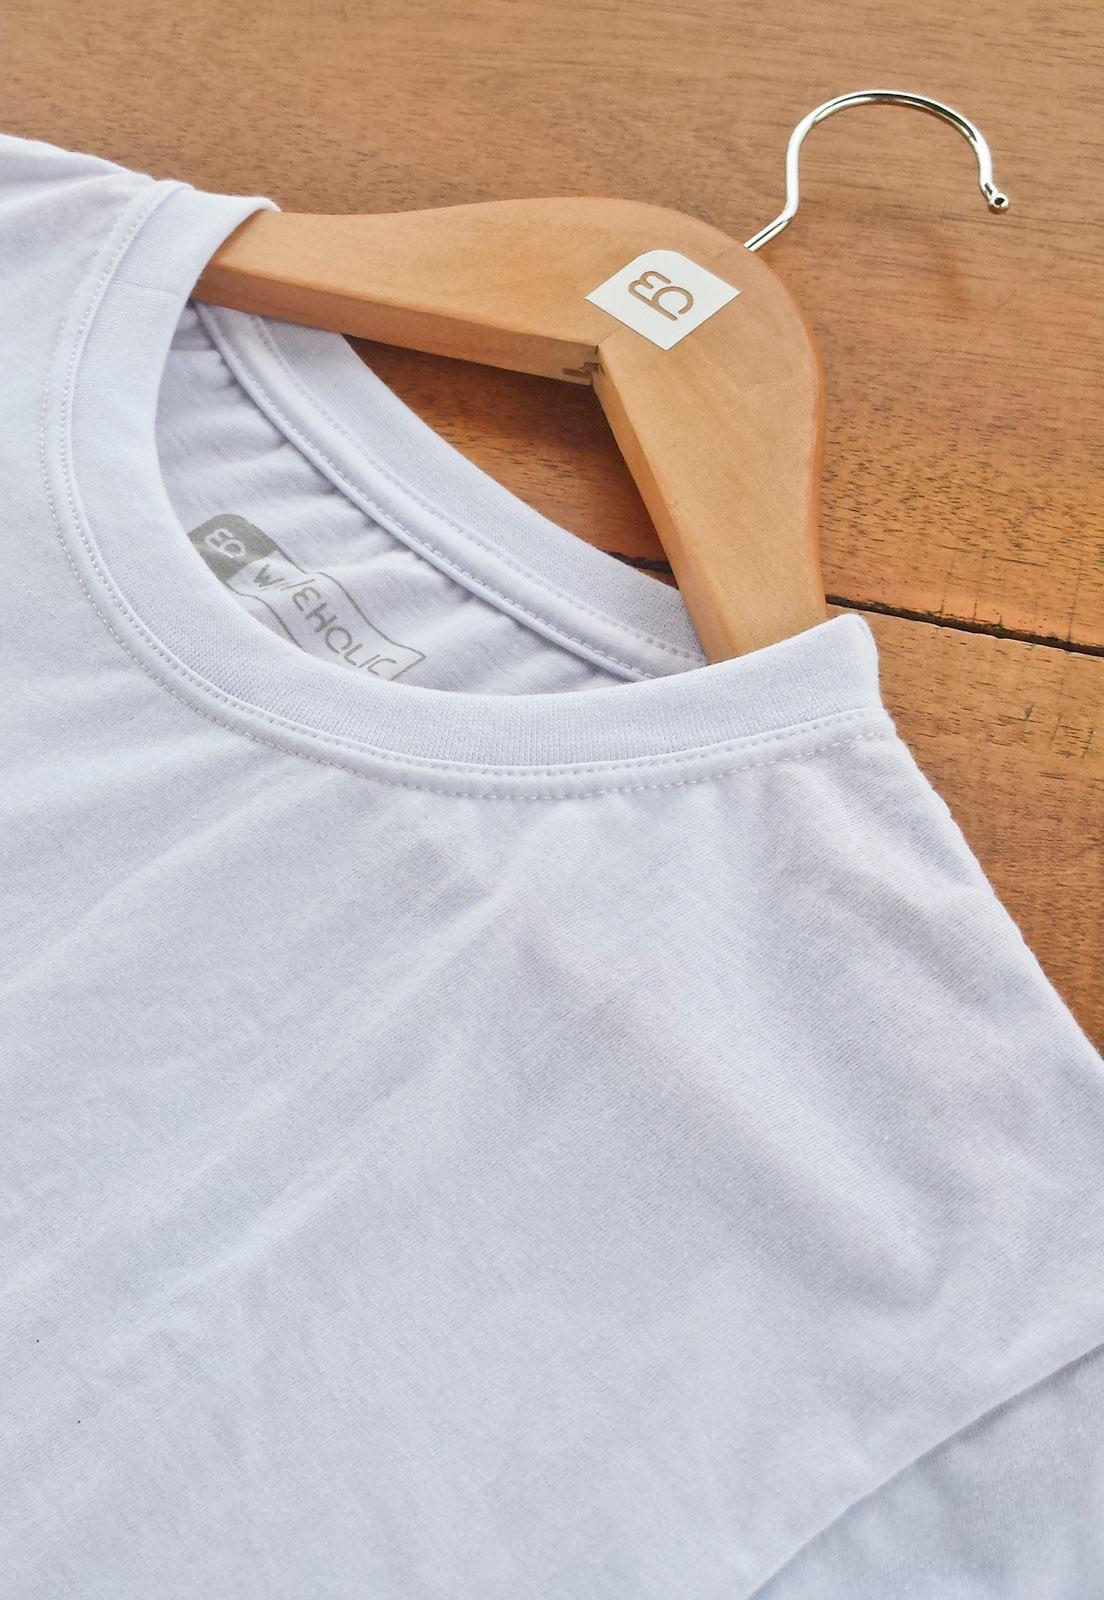 Camiseta estampada branca logo textura do mar